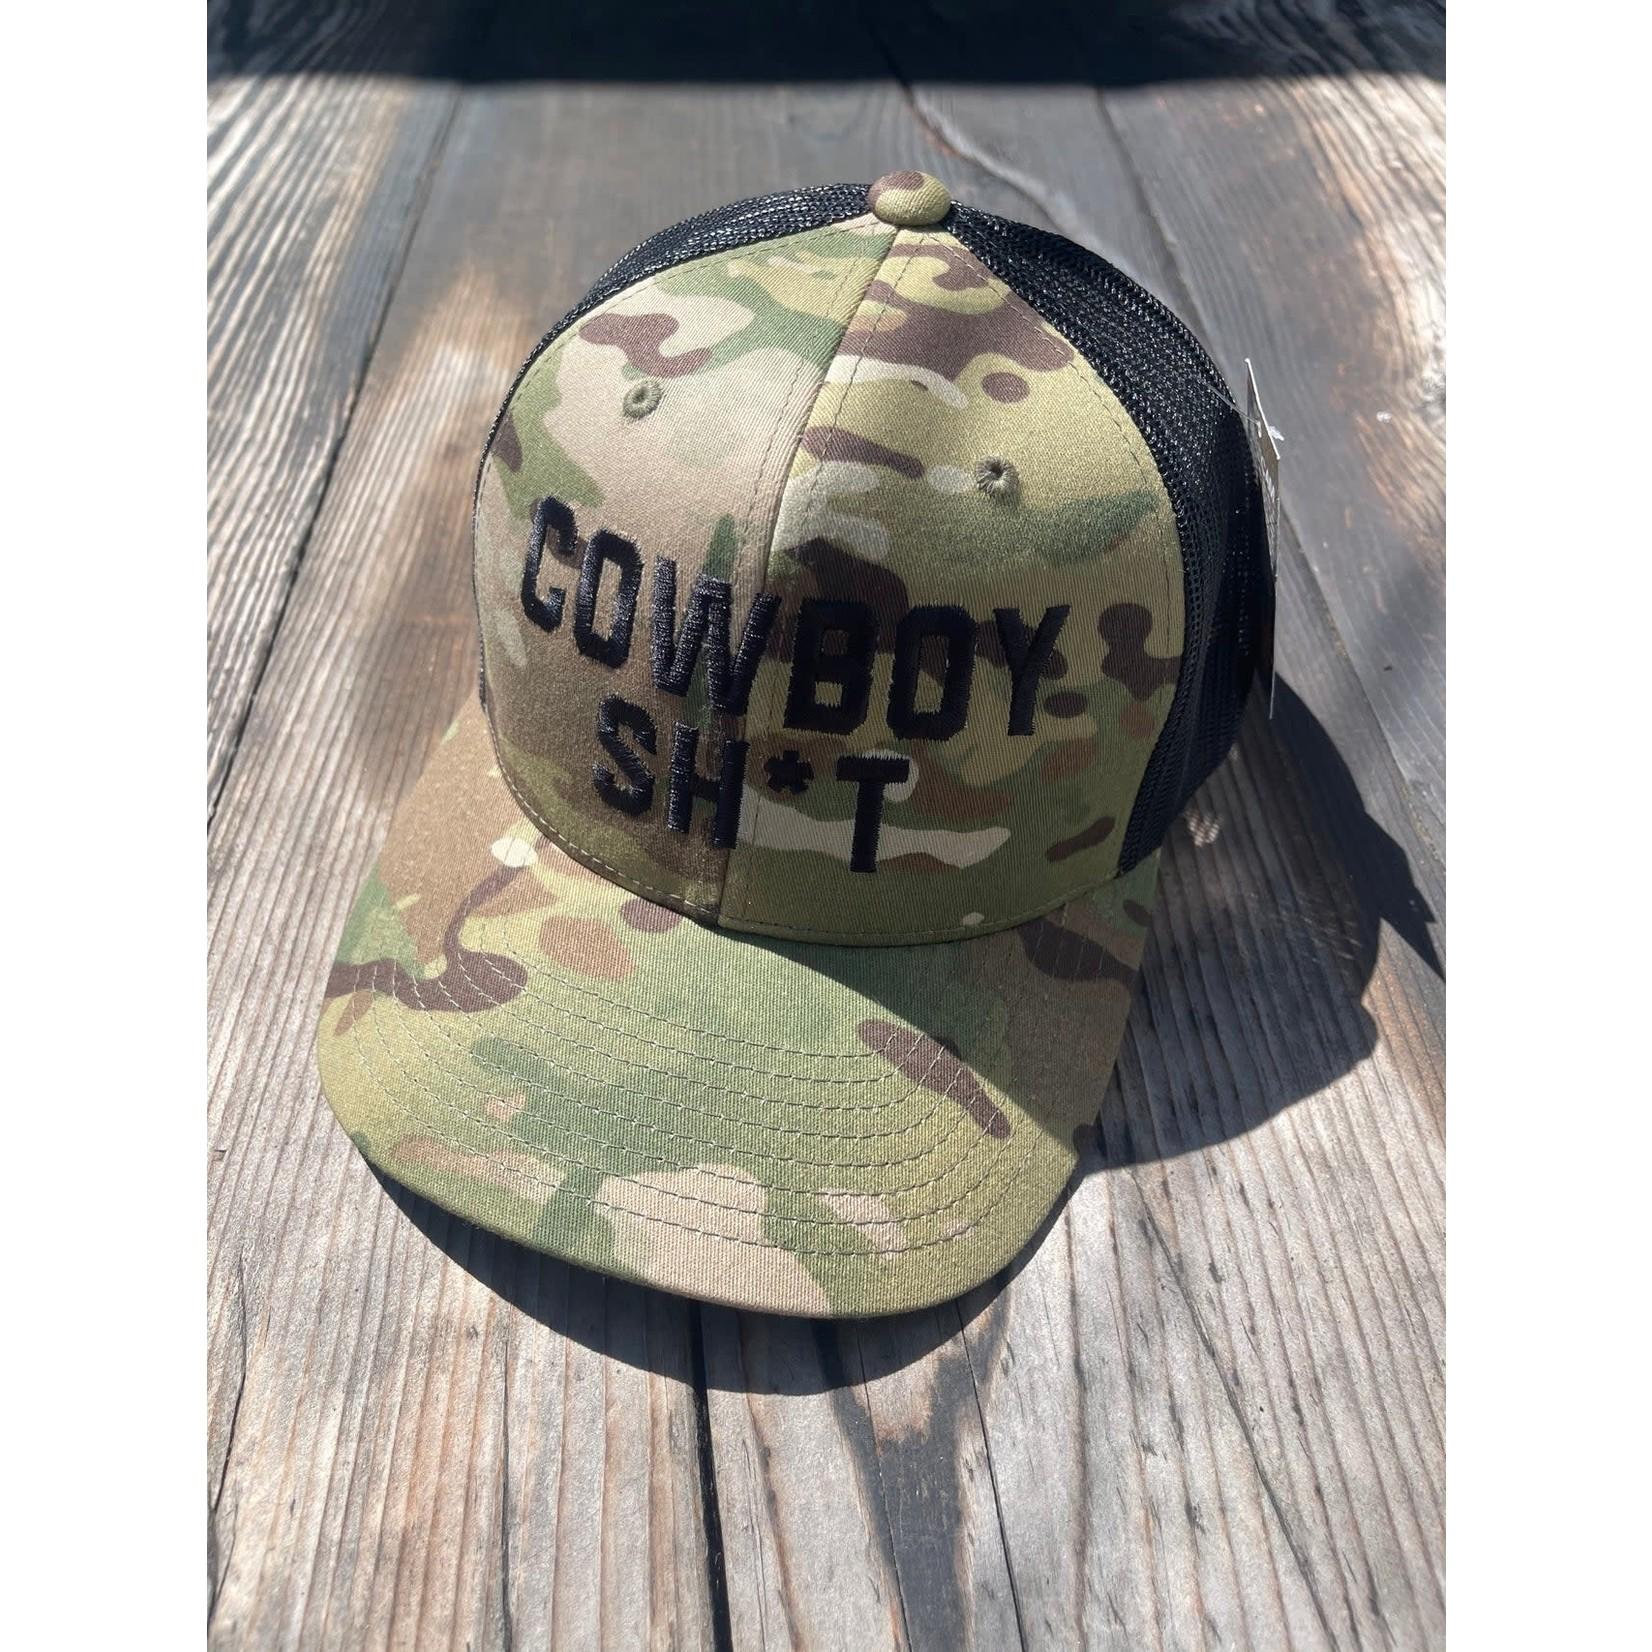 Everything Cowboy Inc. Cowboy Shit - Cochrane Hat